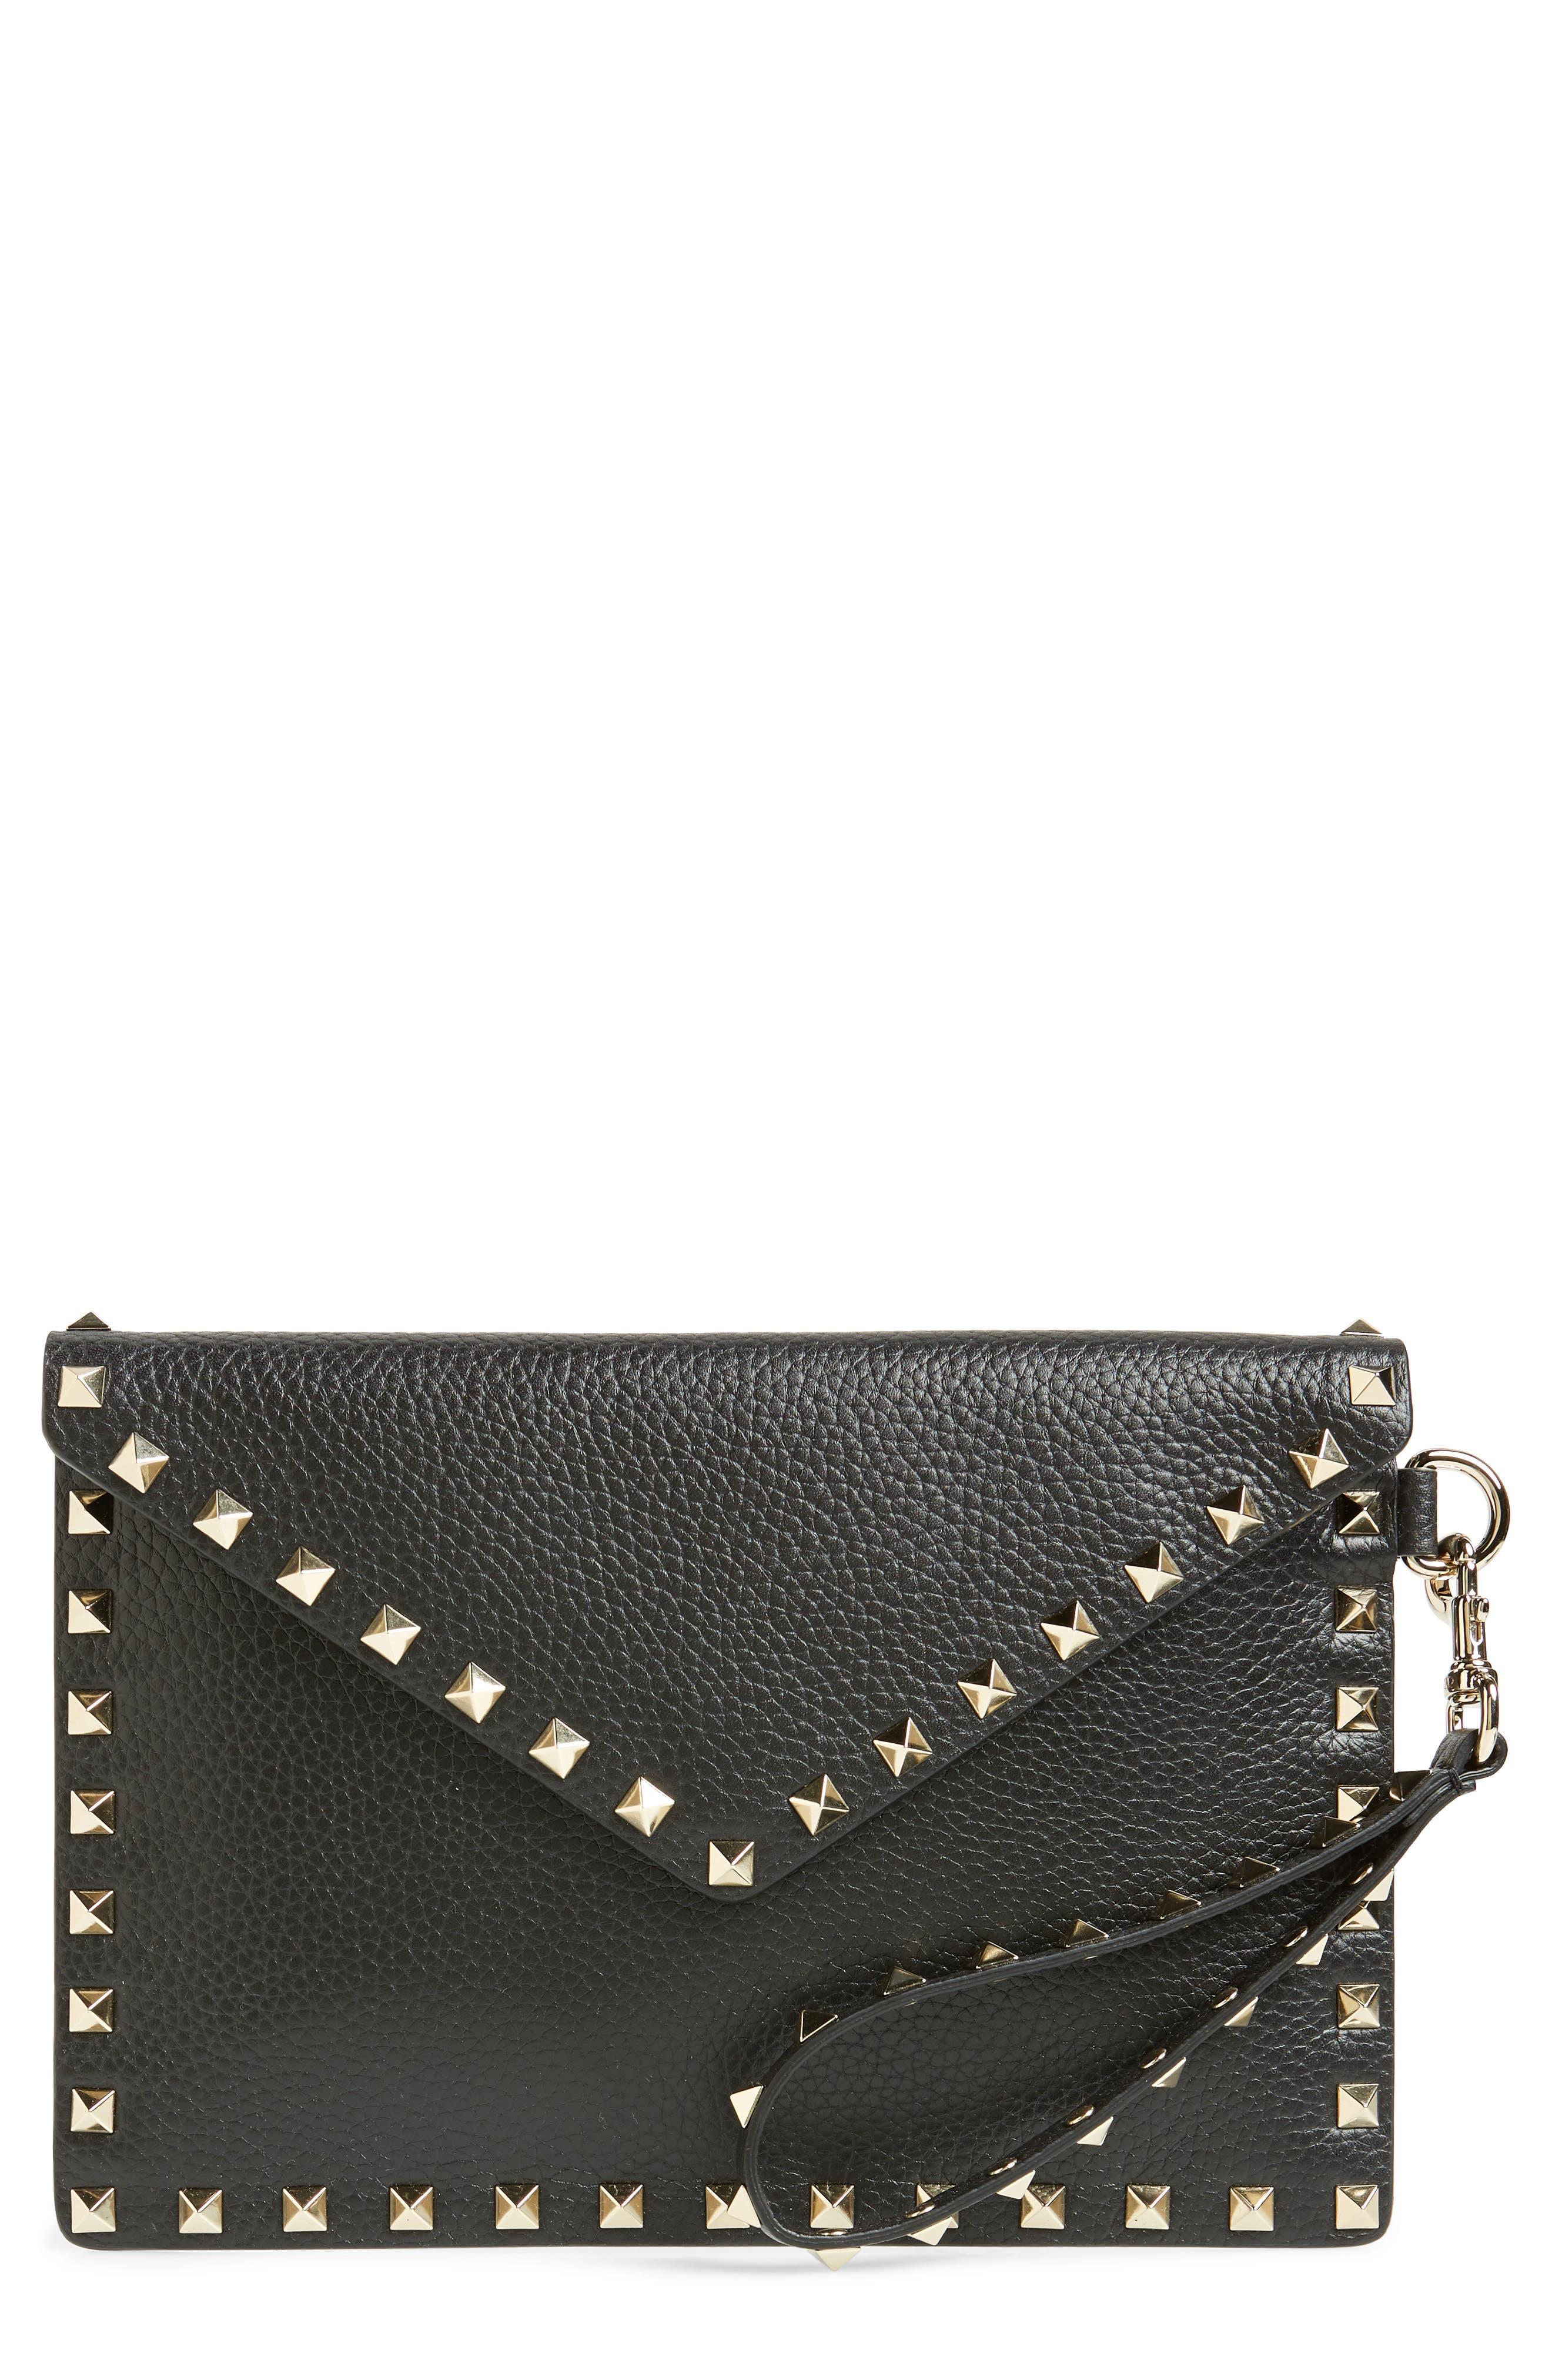 Valentino Garavani Medium Rockstud Leather Envelope Pouch   Nordstrom